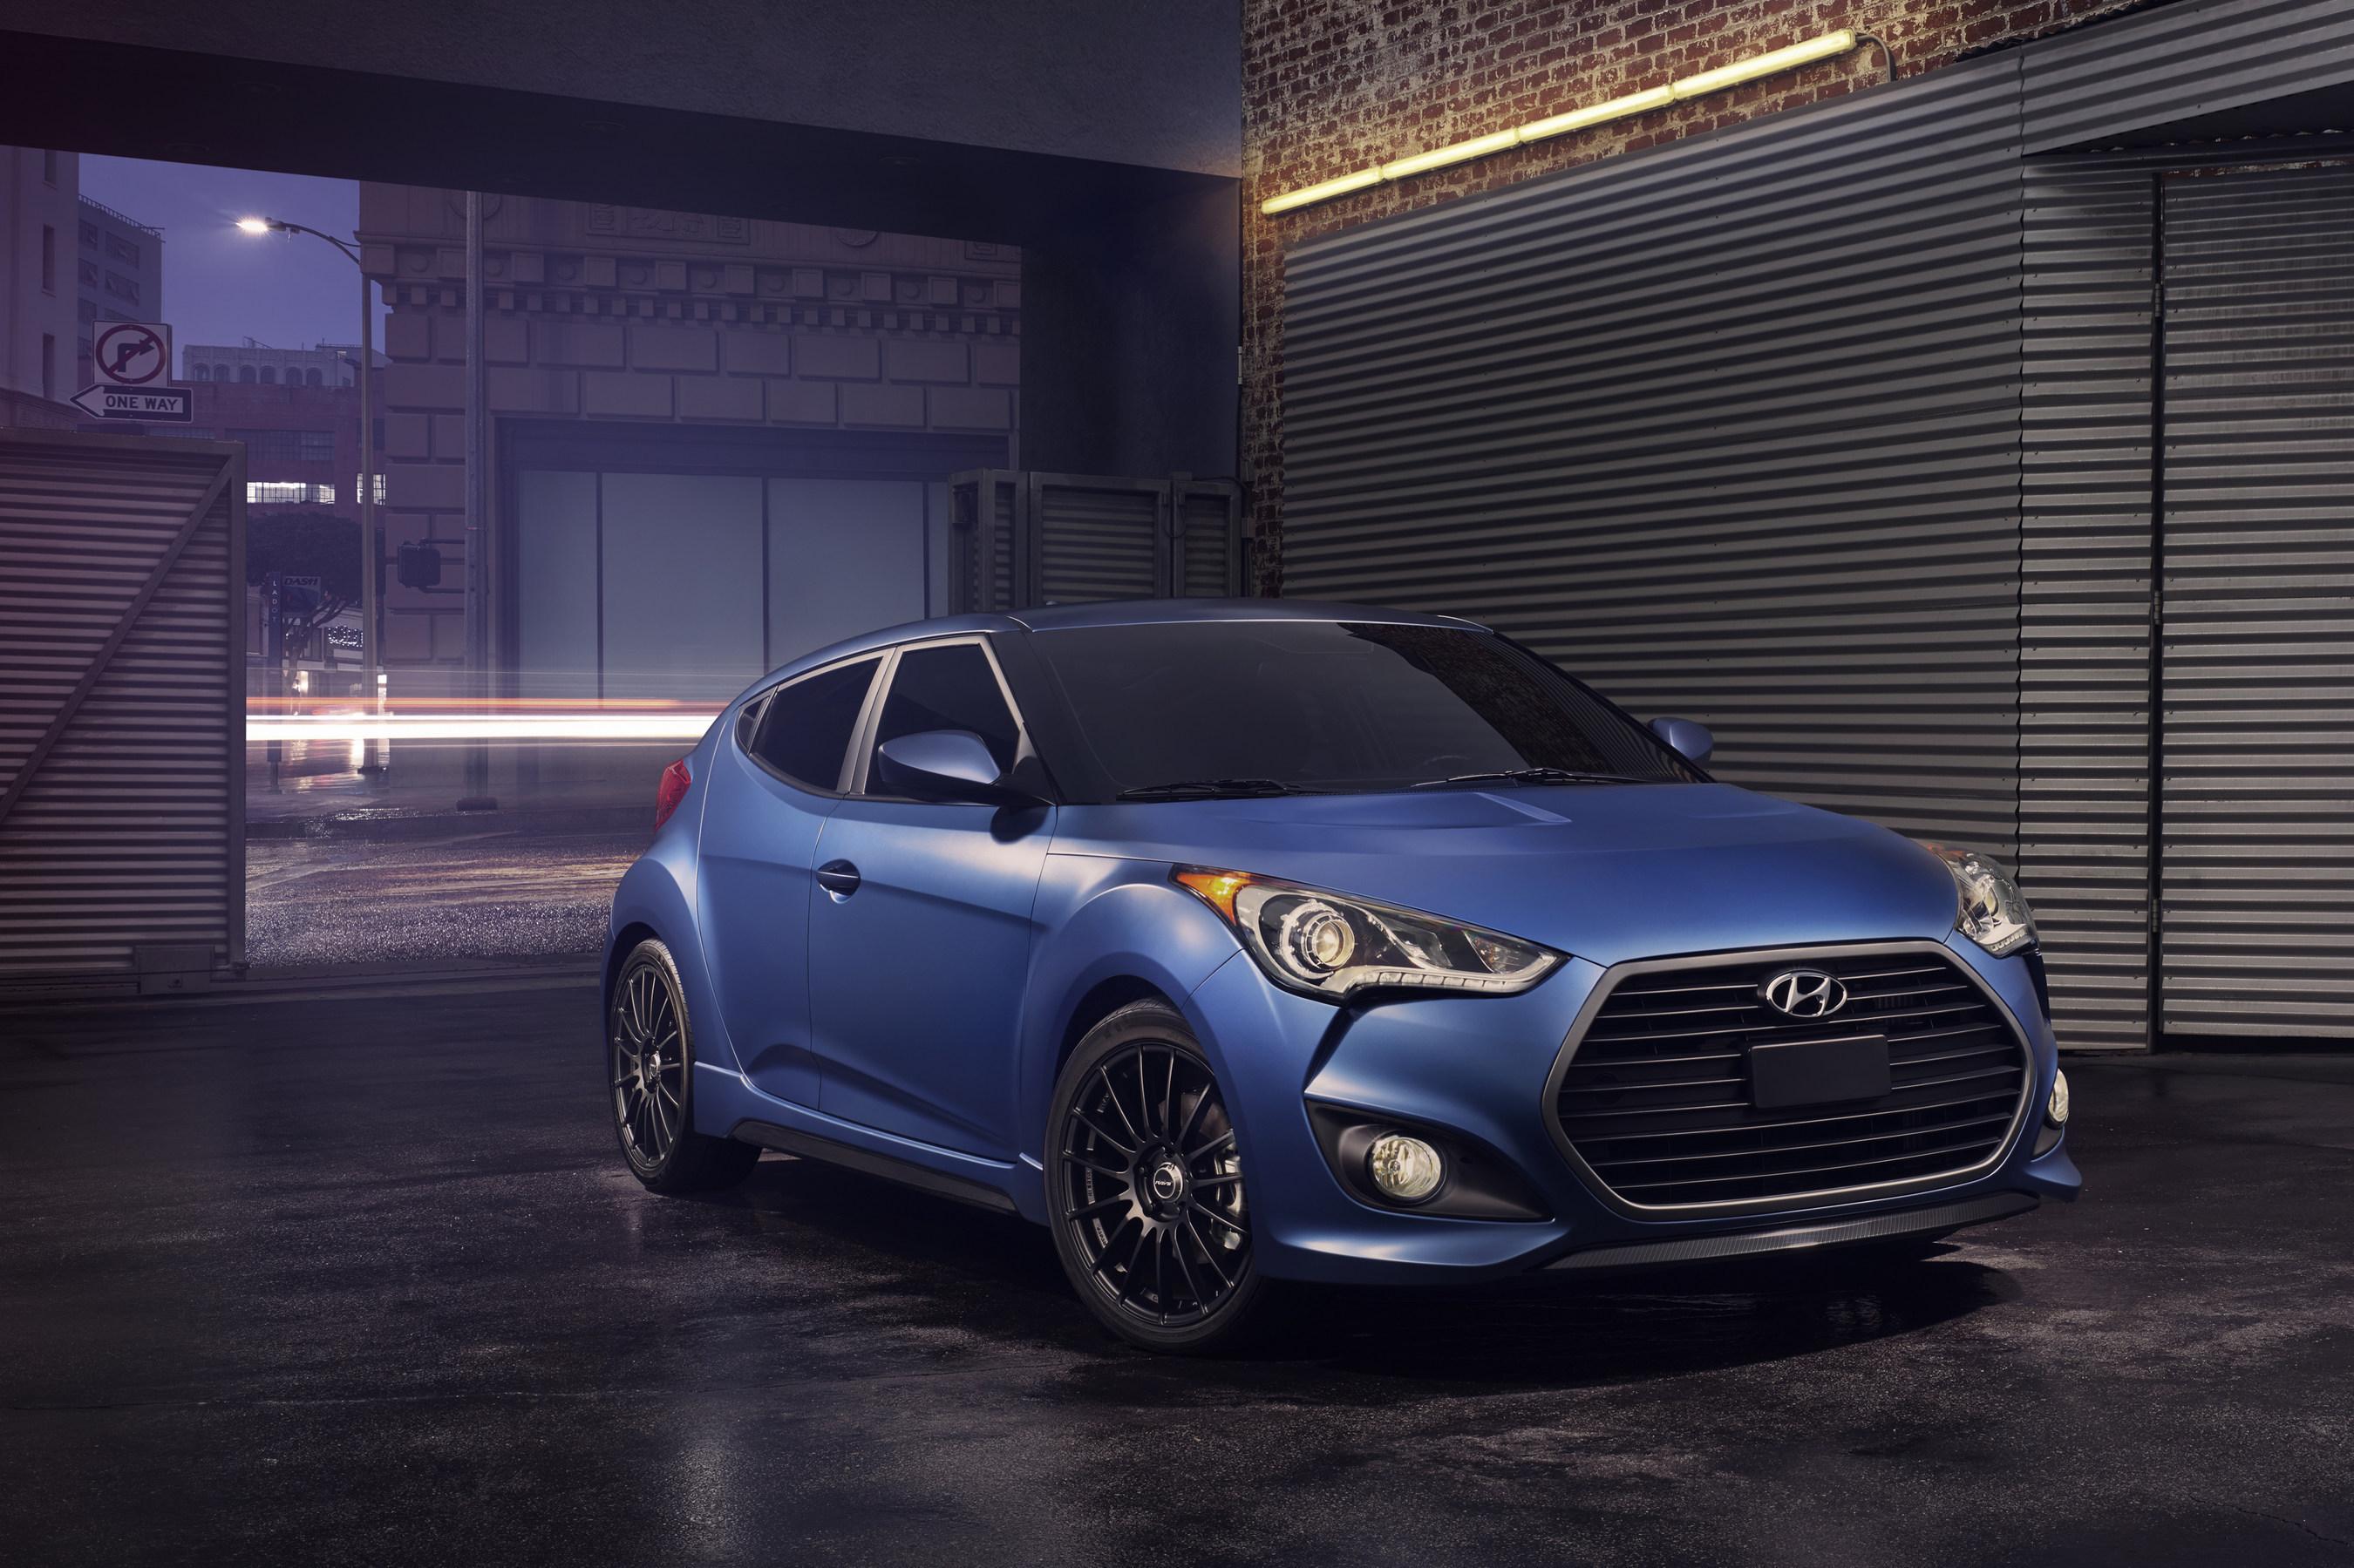 2016 Hyundai Veloster Receives Major Performance Design